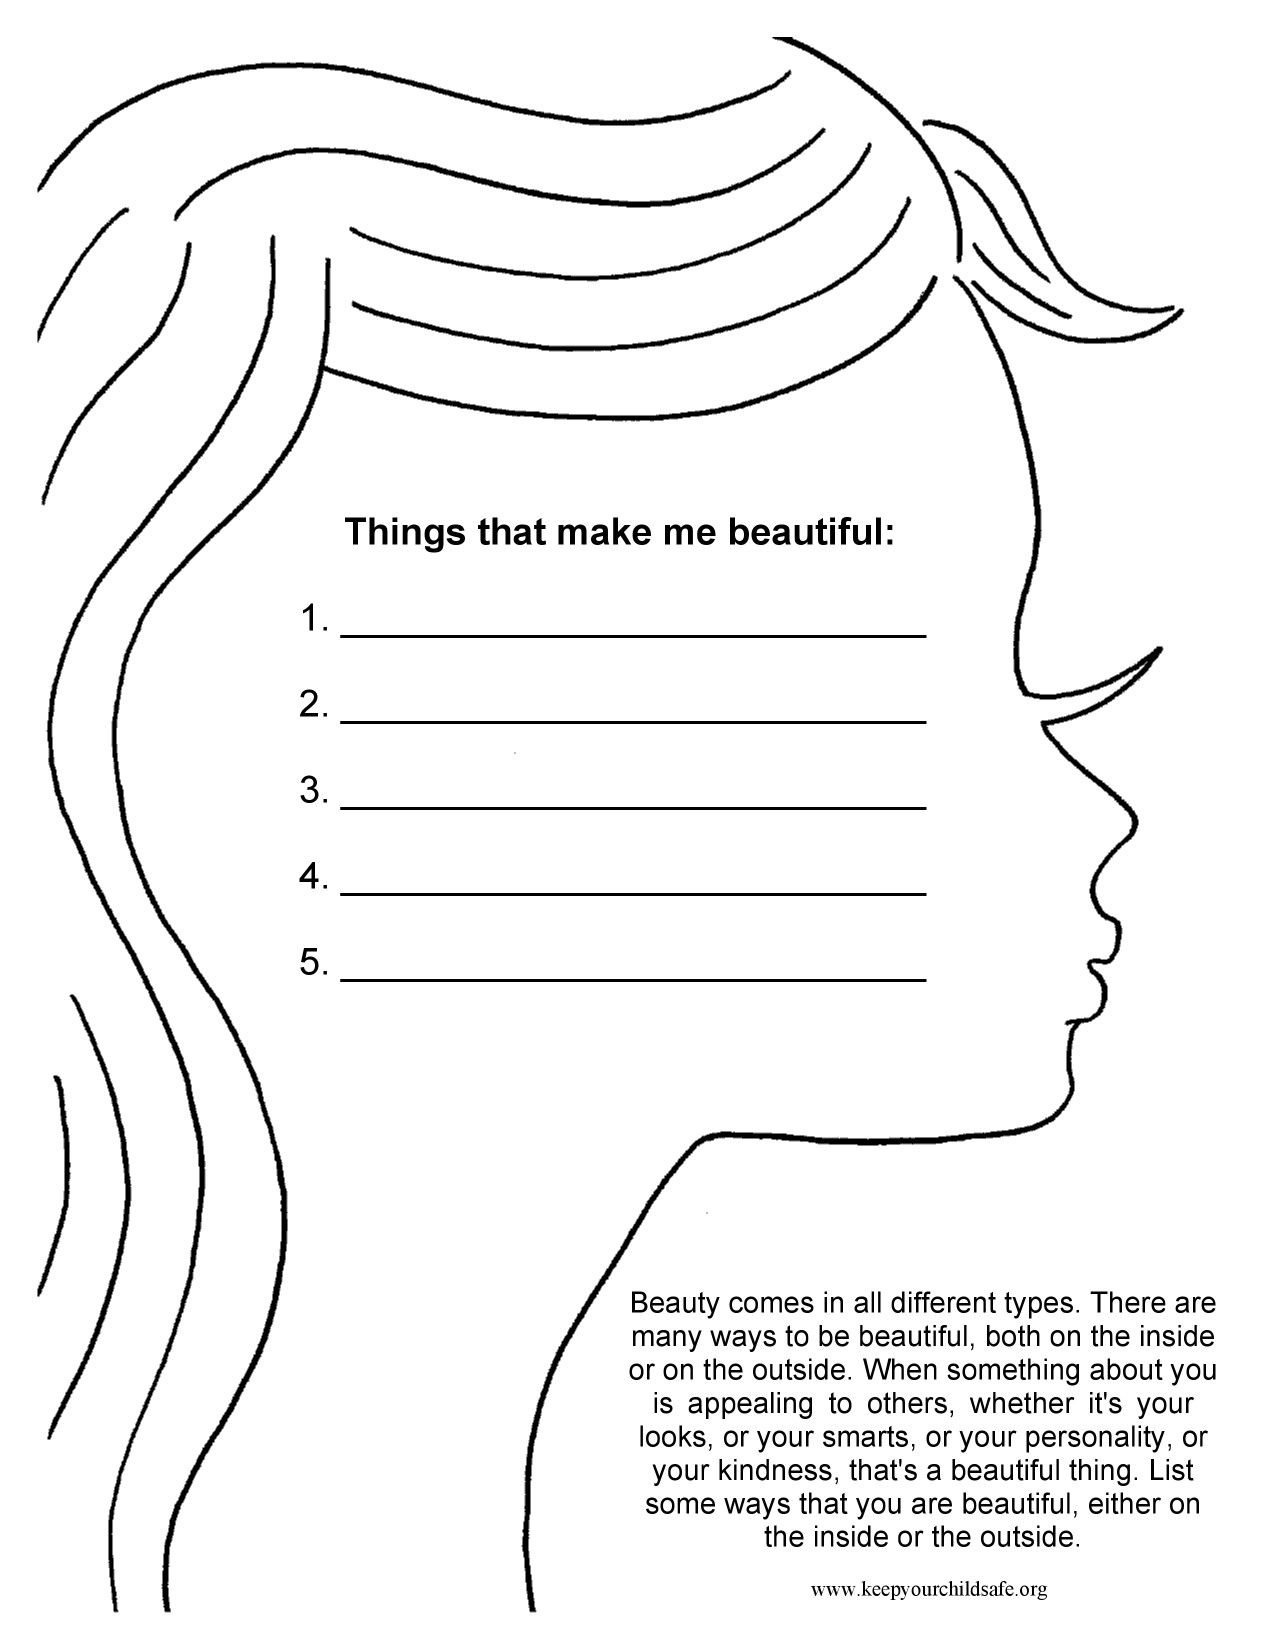 Things that make me beautiful Self esteem worksheets